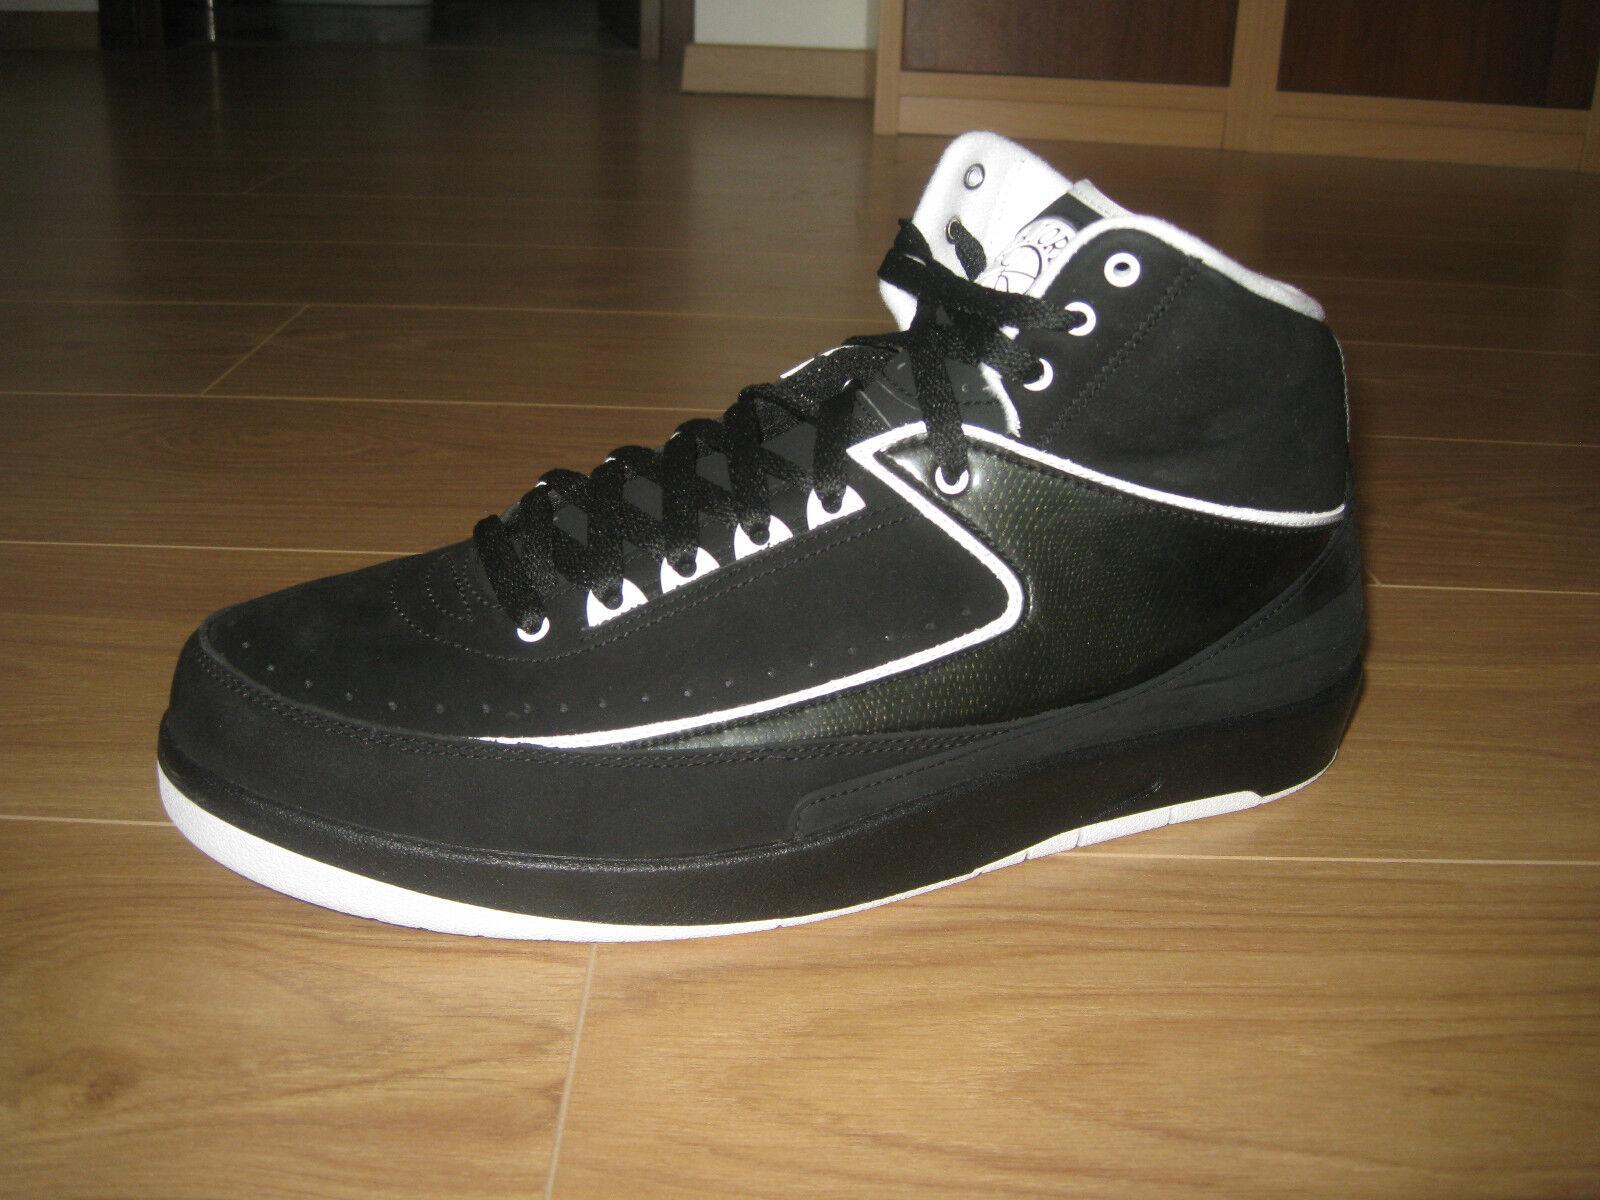 Nike Air Jordan 2 Retro QF Black-White-Suede-Patent Leather